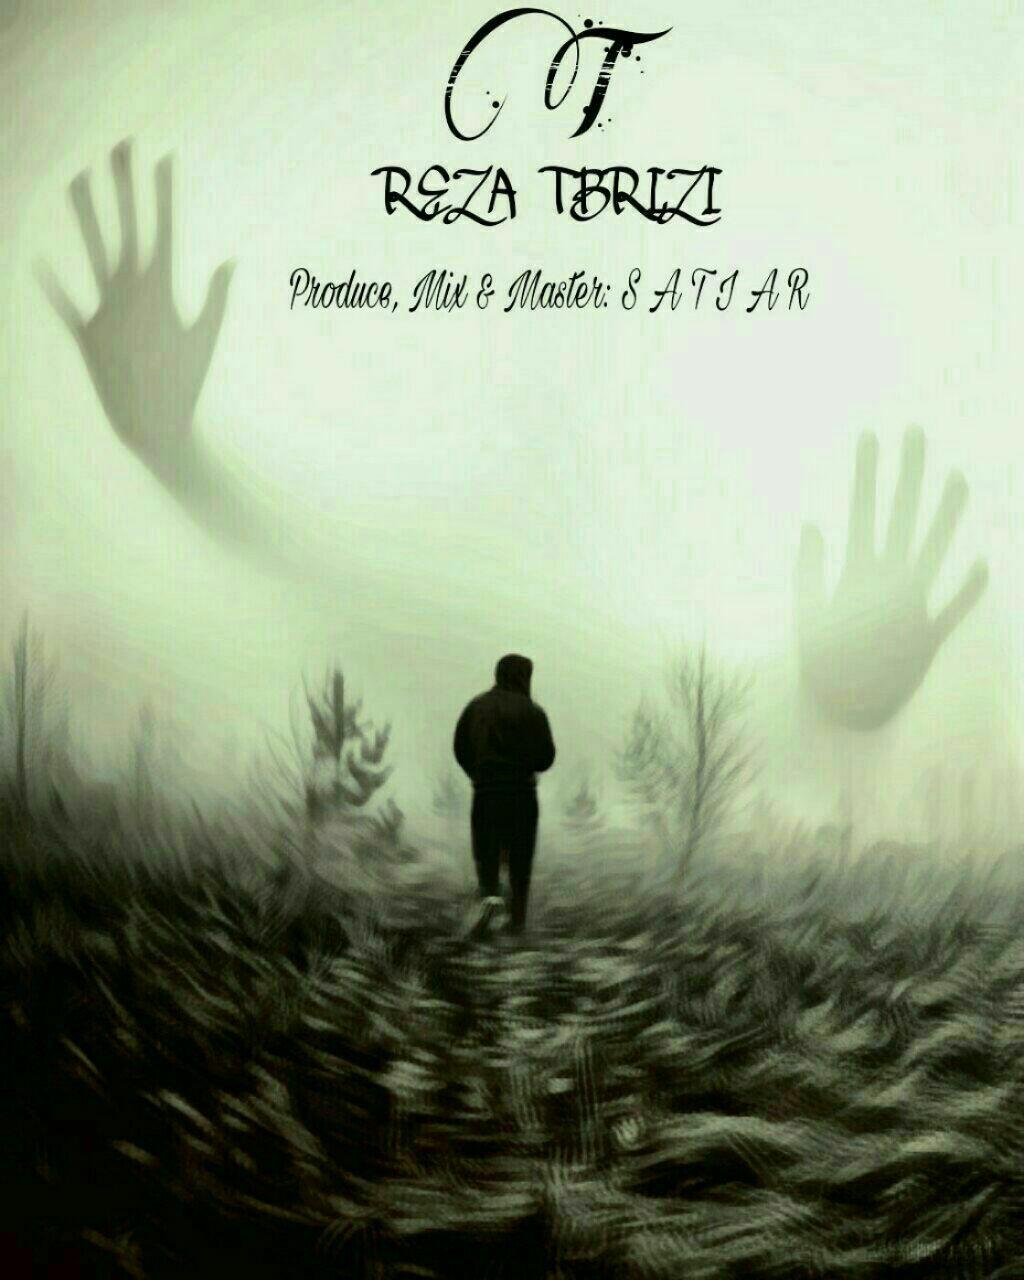 http://s8.picofile.com/file/8300924018/065Reza_Tabrizi_Ot.jpg